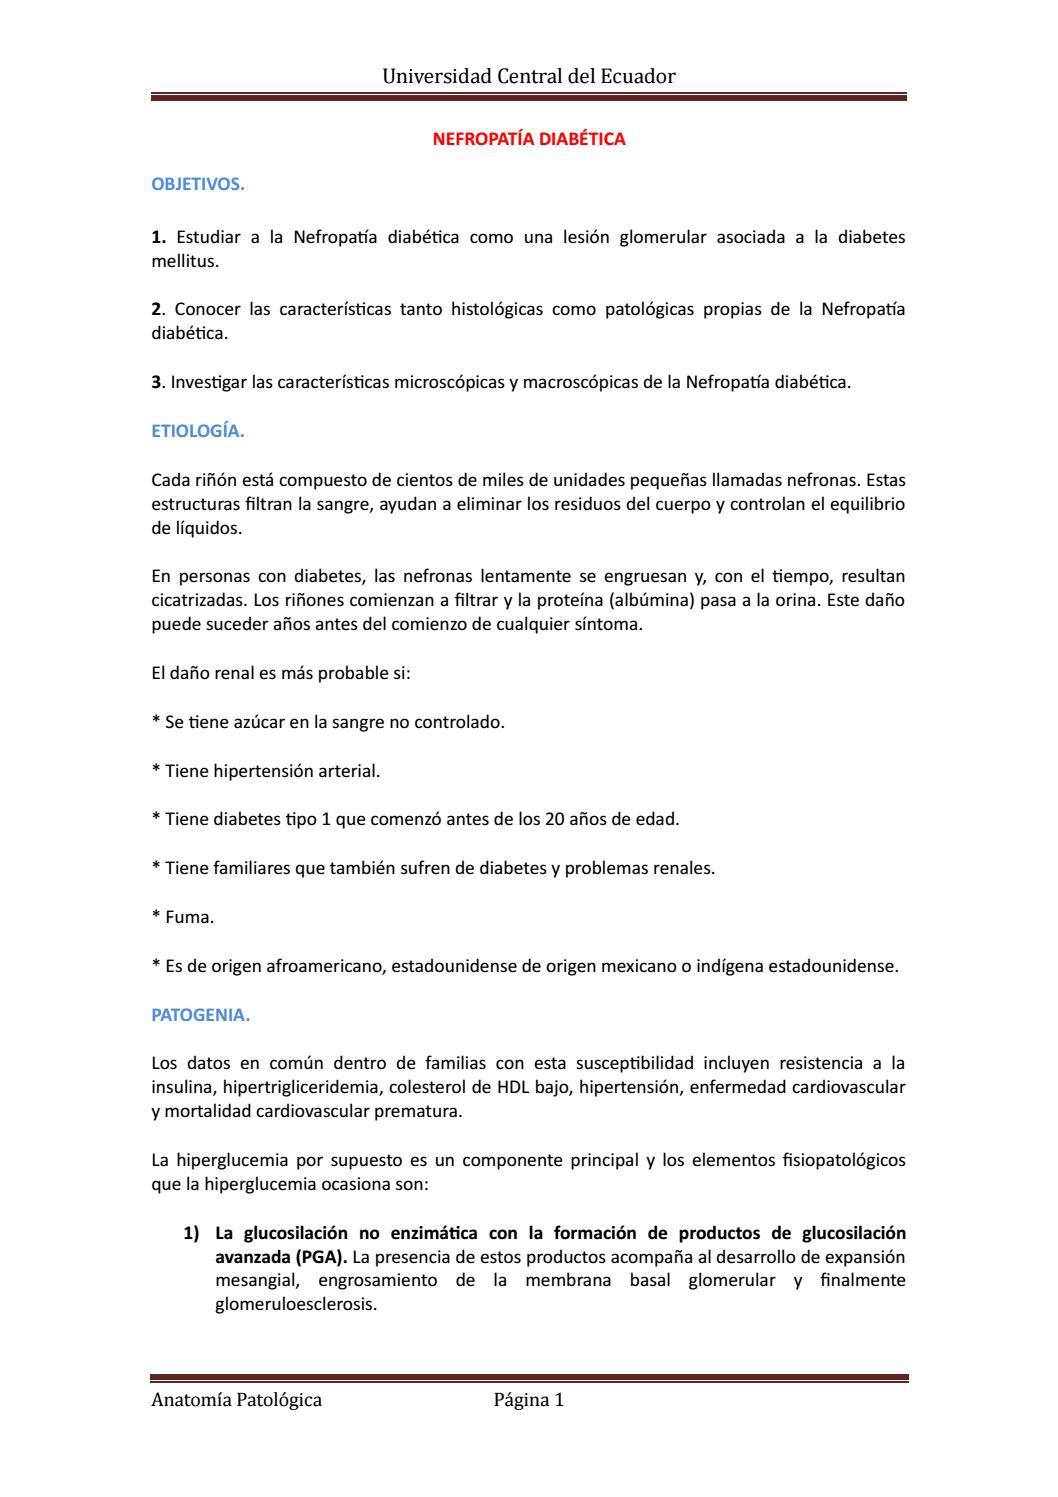 pdf de diabetes de nefropatía